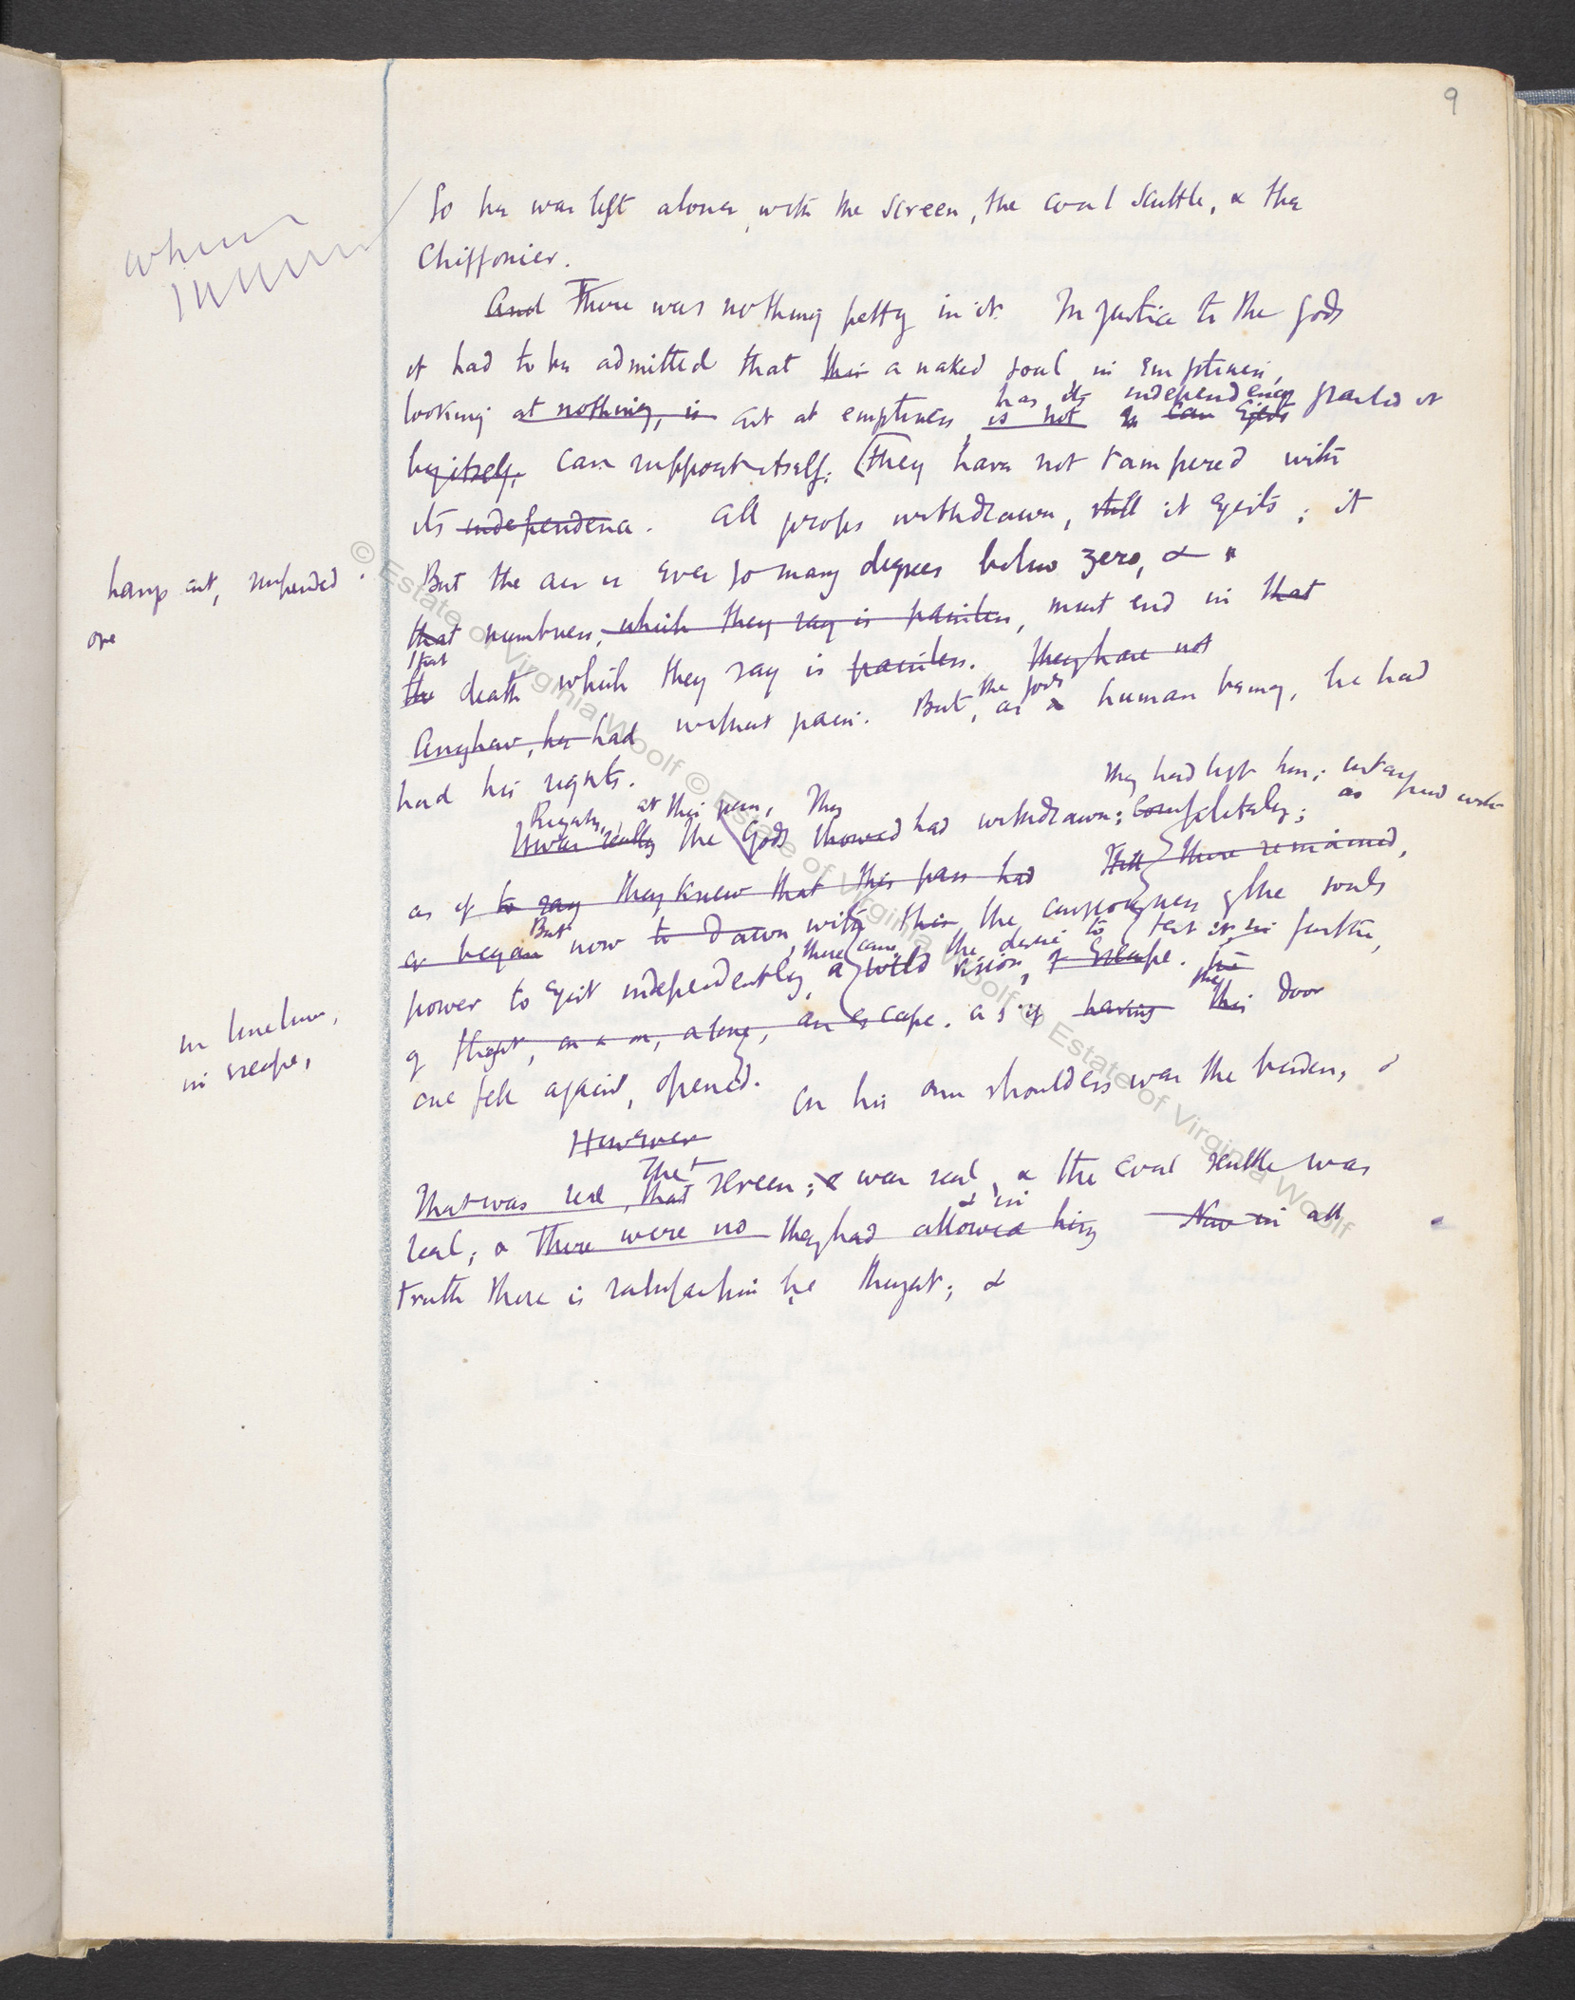 Notebook drafts of Virginia Woolf's Mrs Dalloway (Volume III)